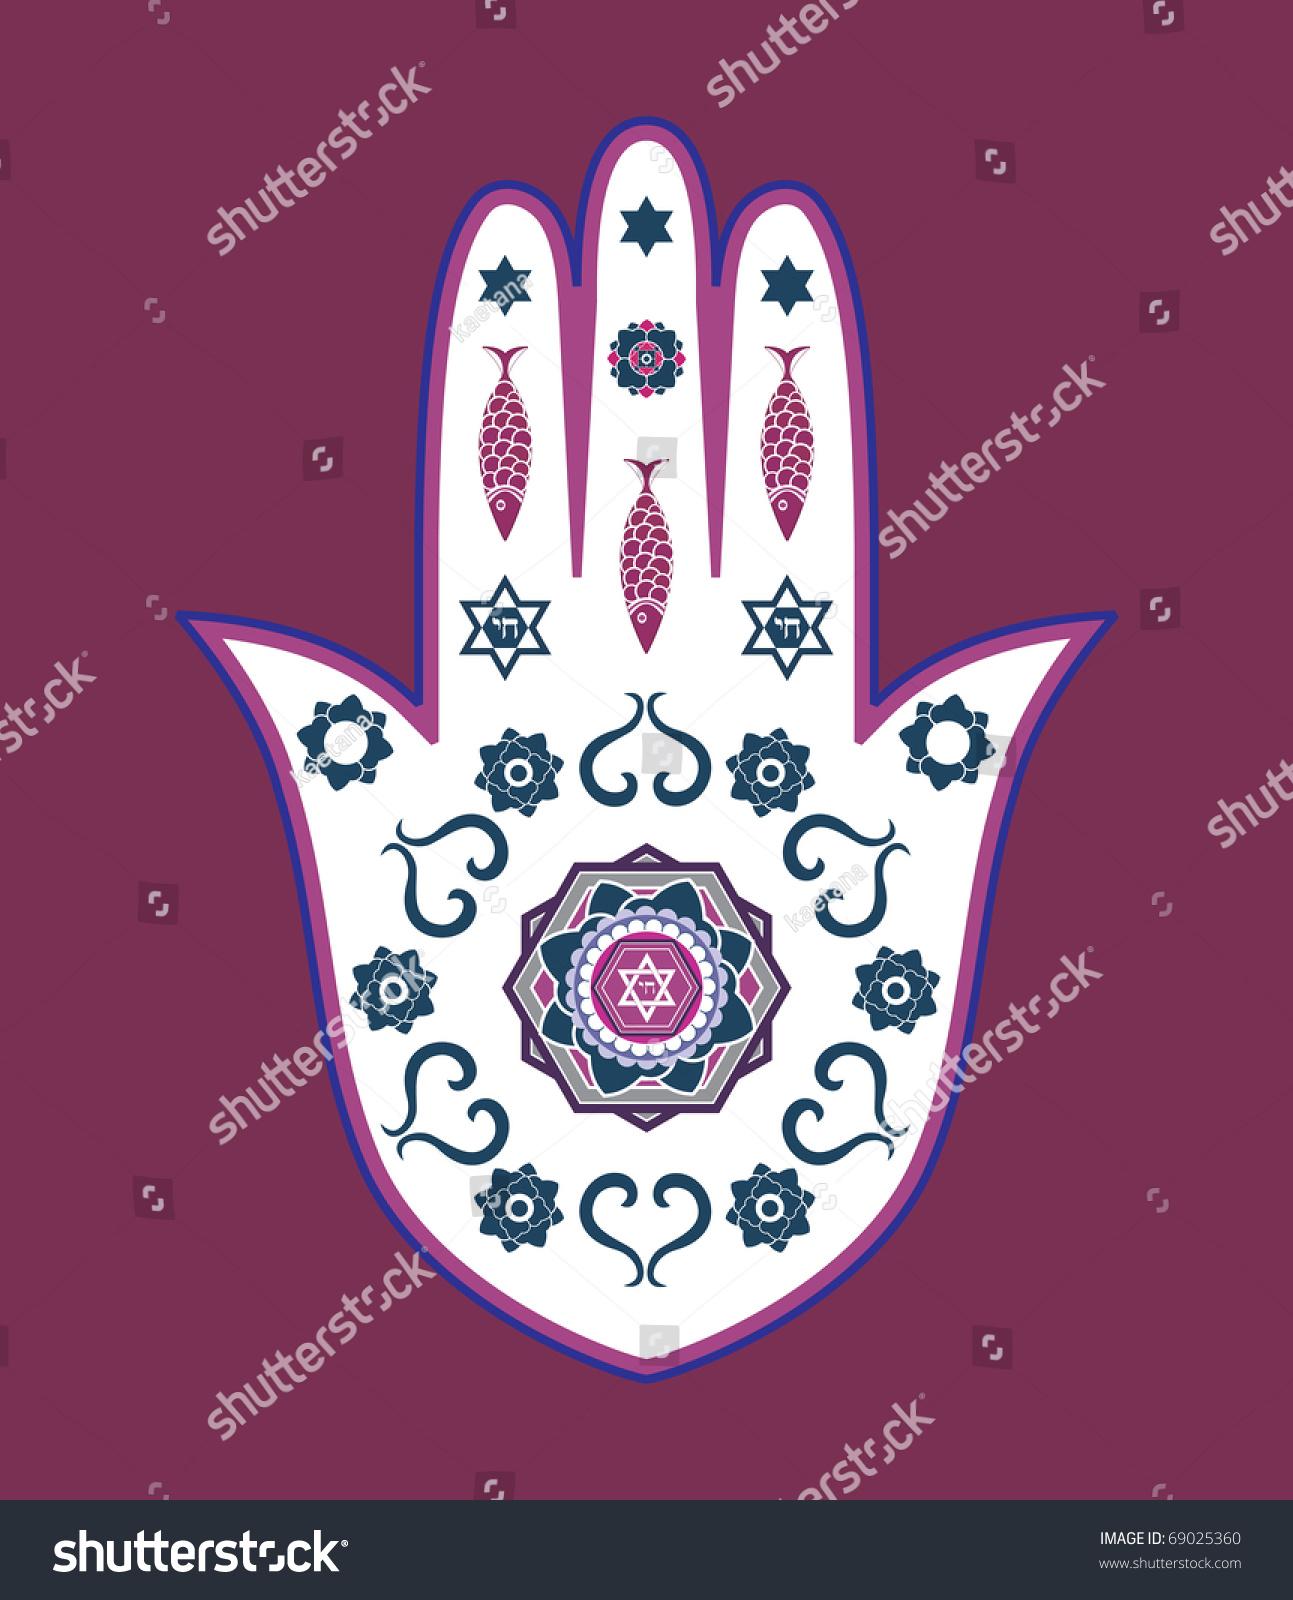 Royalty Free Jewish Hamsa Hand Amulet Or Miriam 69025360 Stock